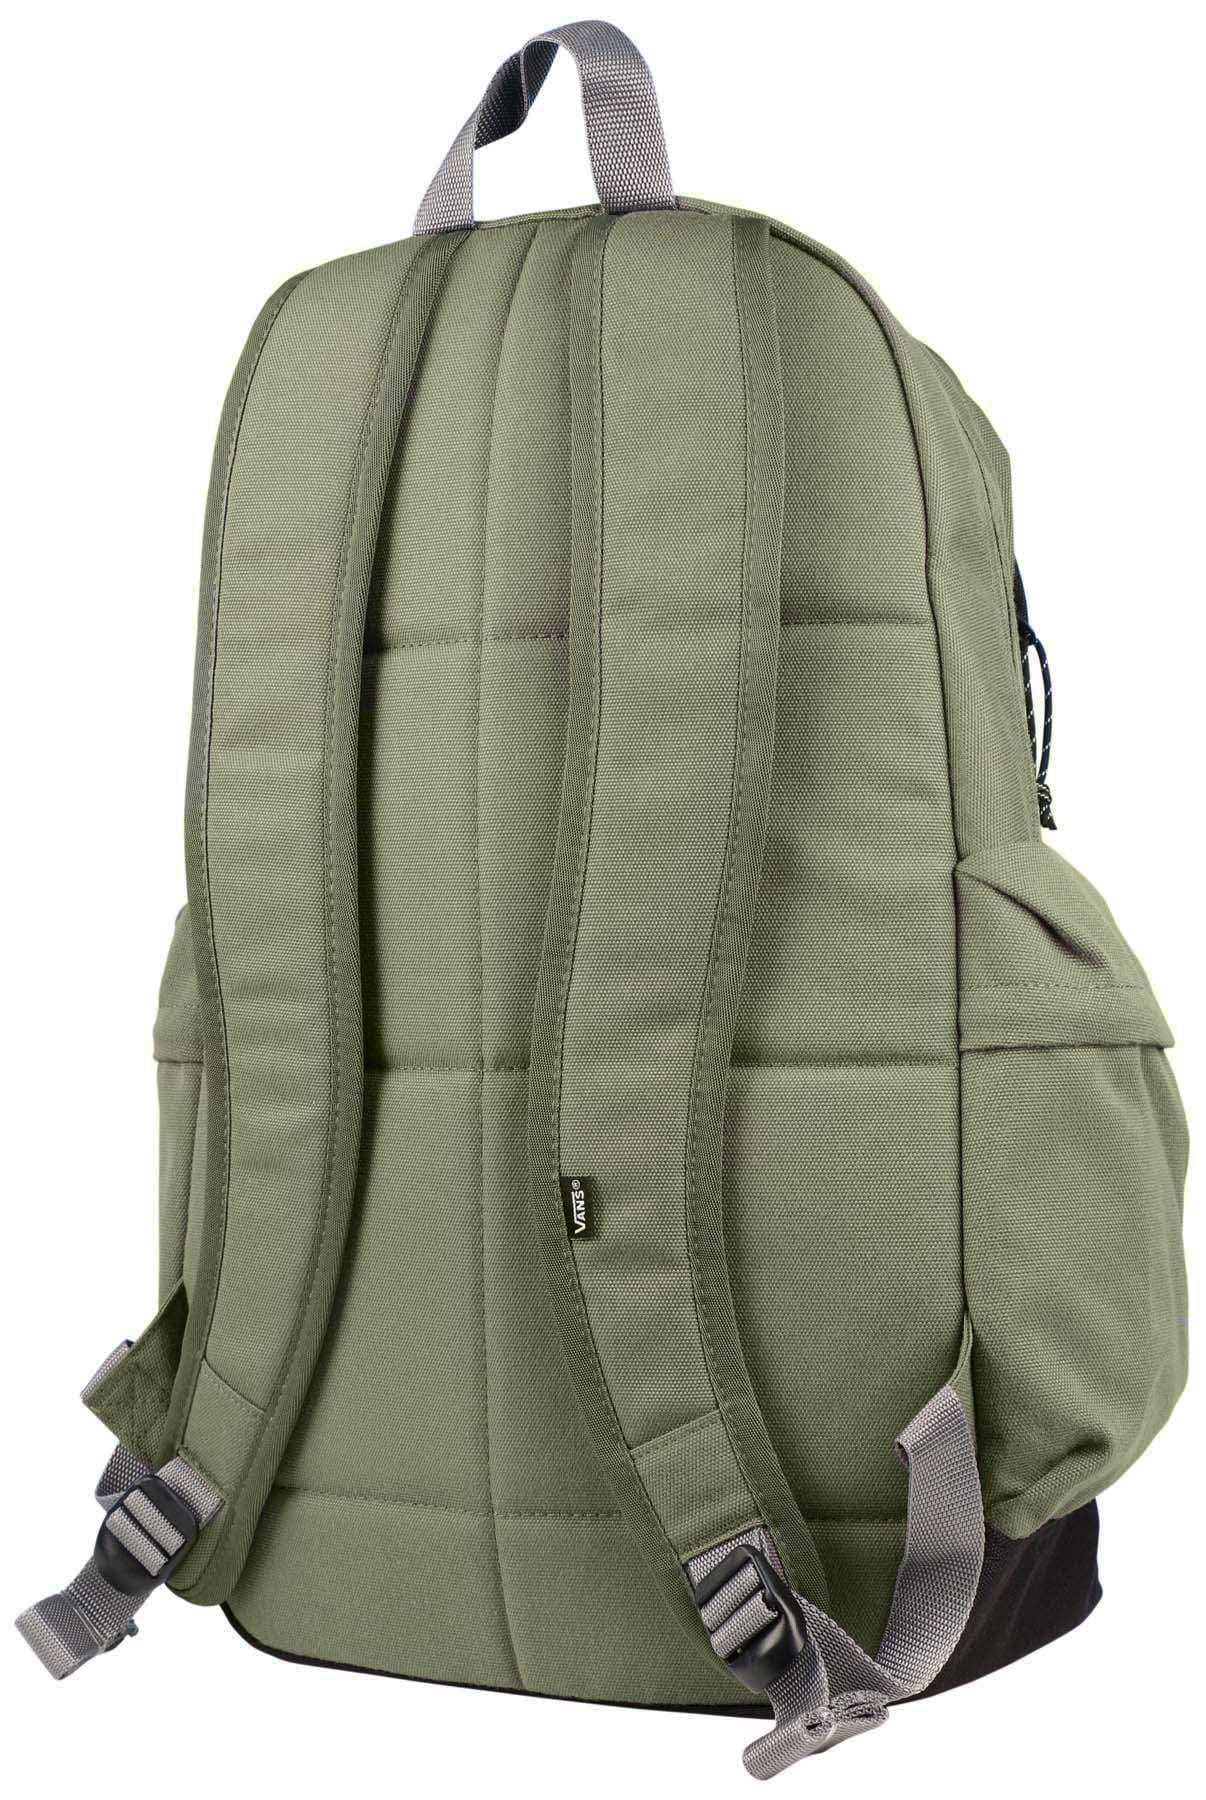 880e57e08b Vans - Off The Wall Jetter Carry All Skate Backpack - Walmart.com